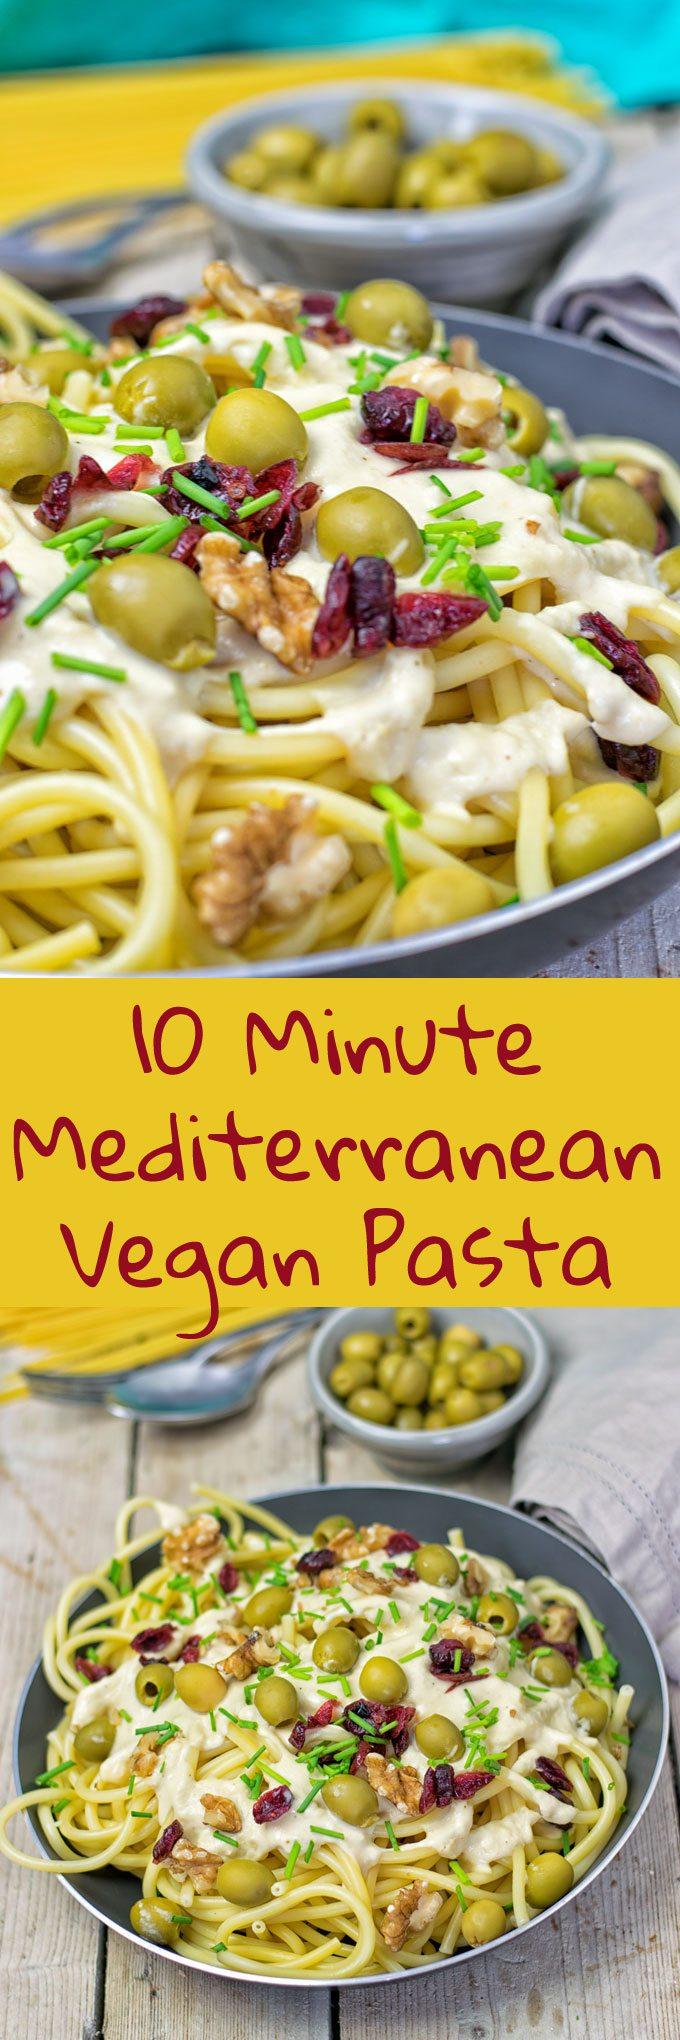 10 Minute Mediterranean Vegan Pasta   #vegan #glutenfree www.contentednesscooking.com